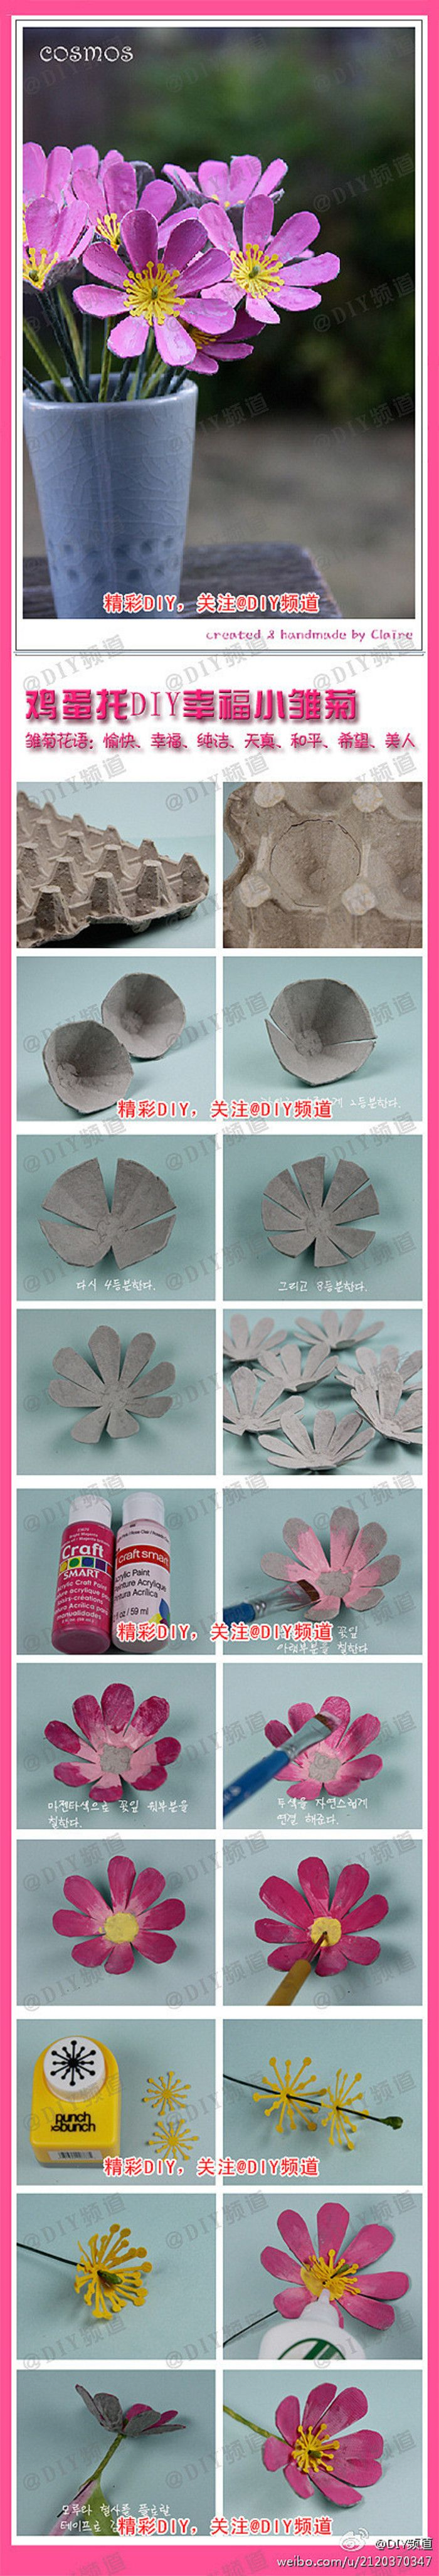 Egg packaging flower Flores con envases para